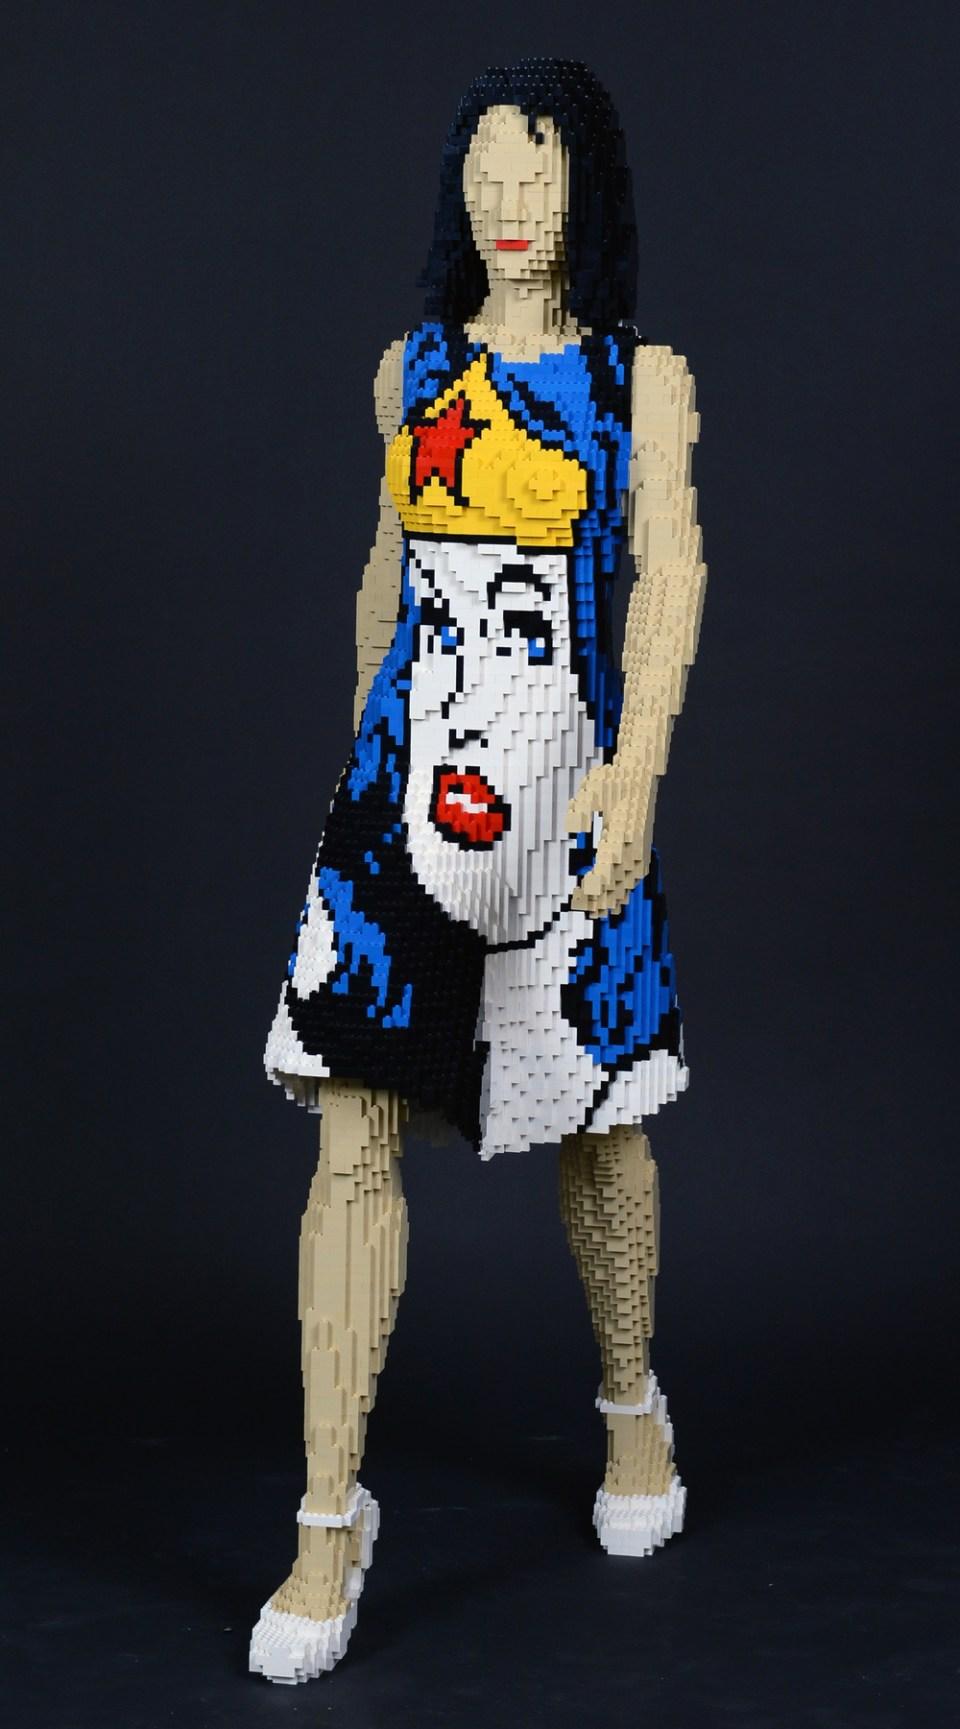 LEGO+Wonder+Woman+dress